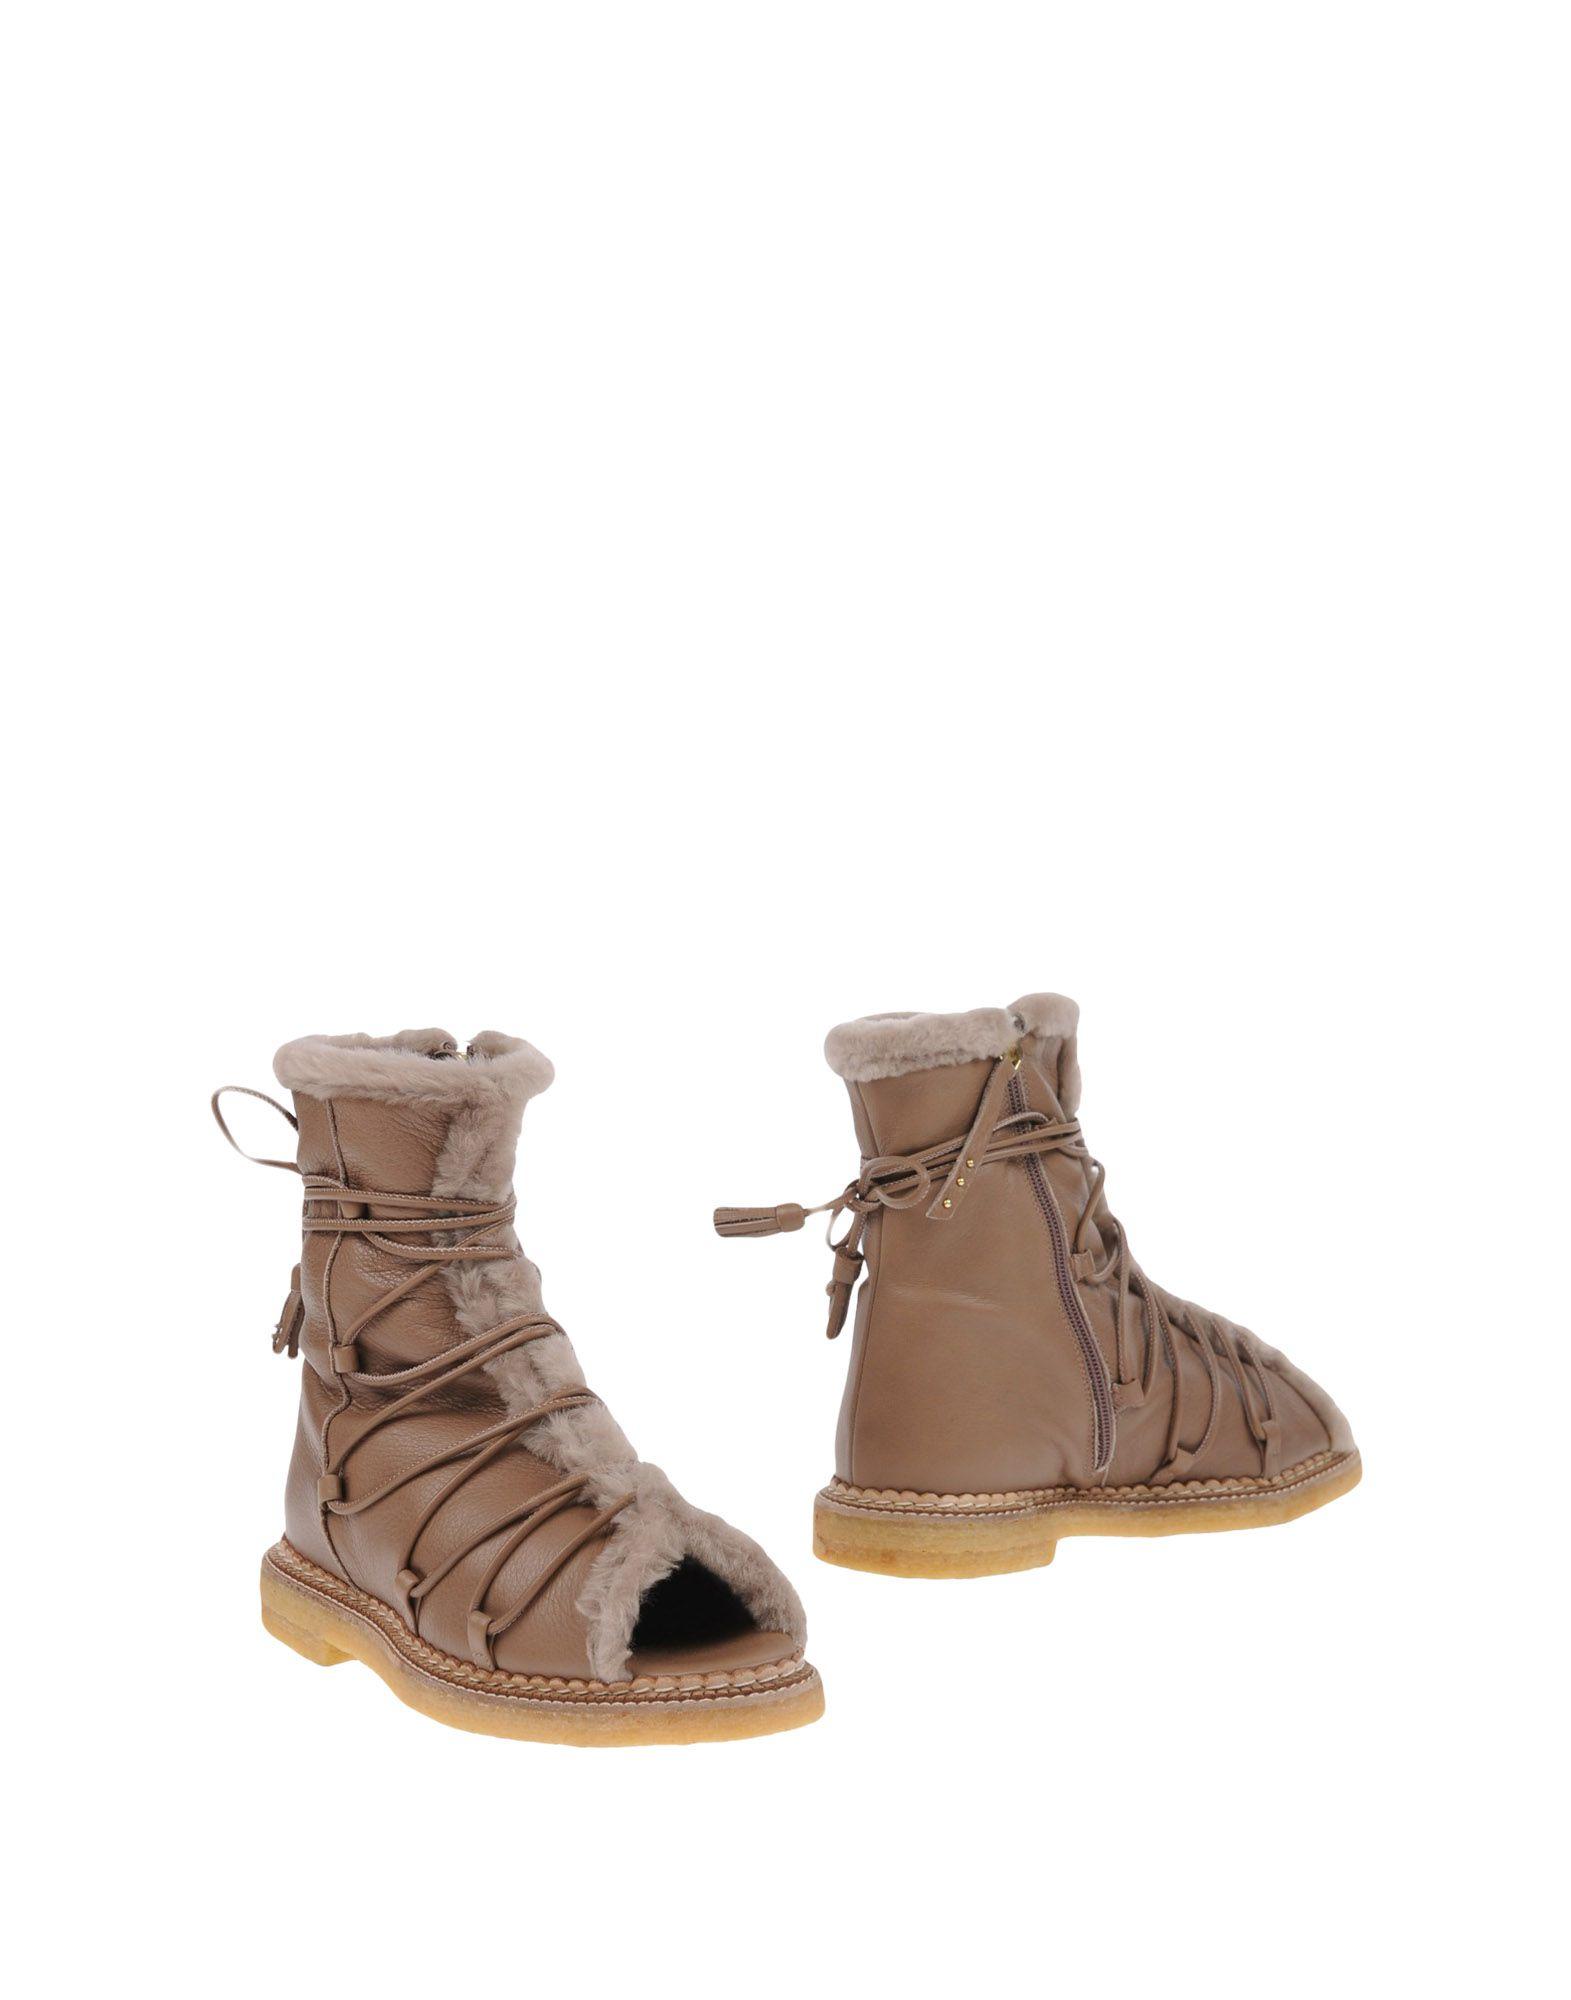 Paloma Barceló Paloma Ankle Boot - Women Paloma Barceló Barceló Ankle Boots online on  Canada - 11225426NT 71033d